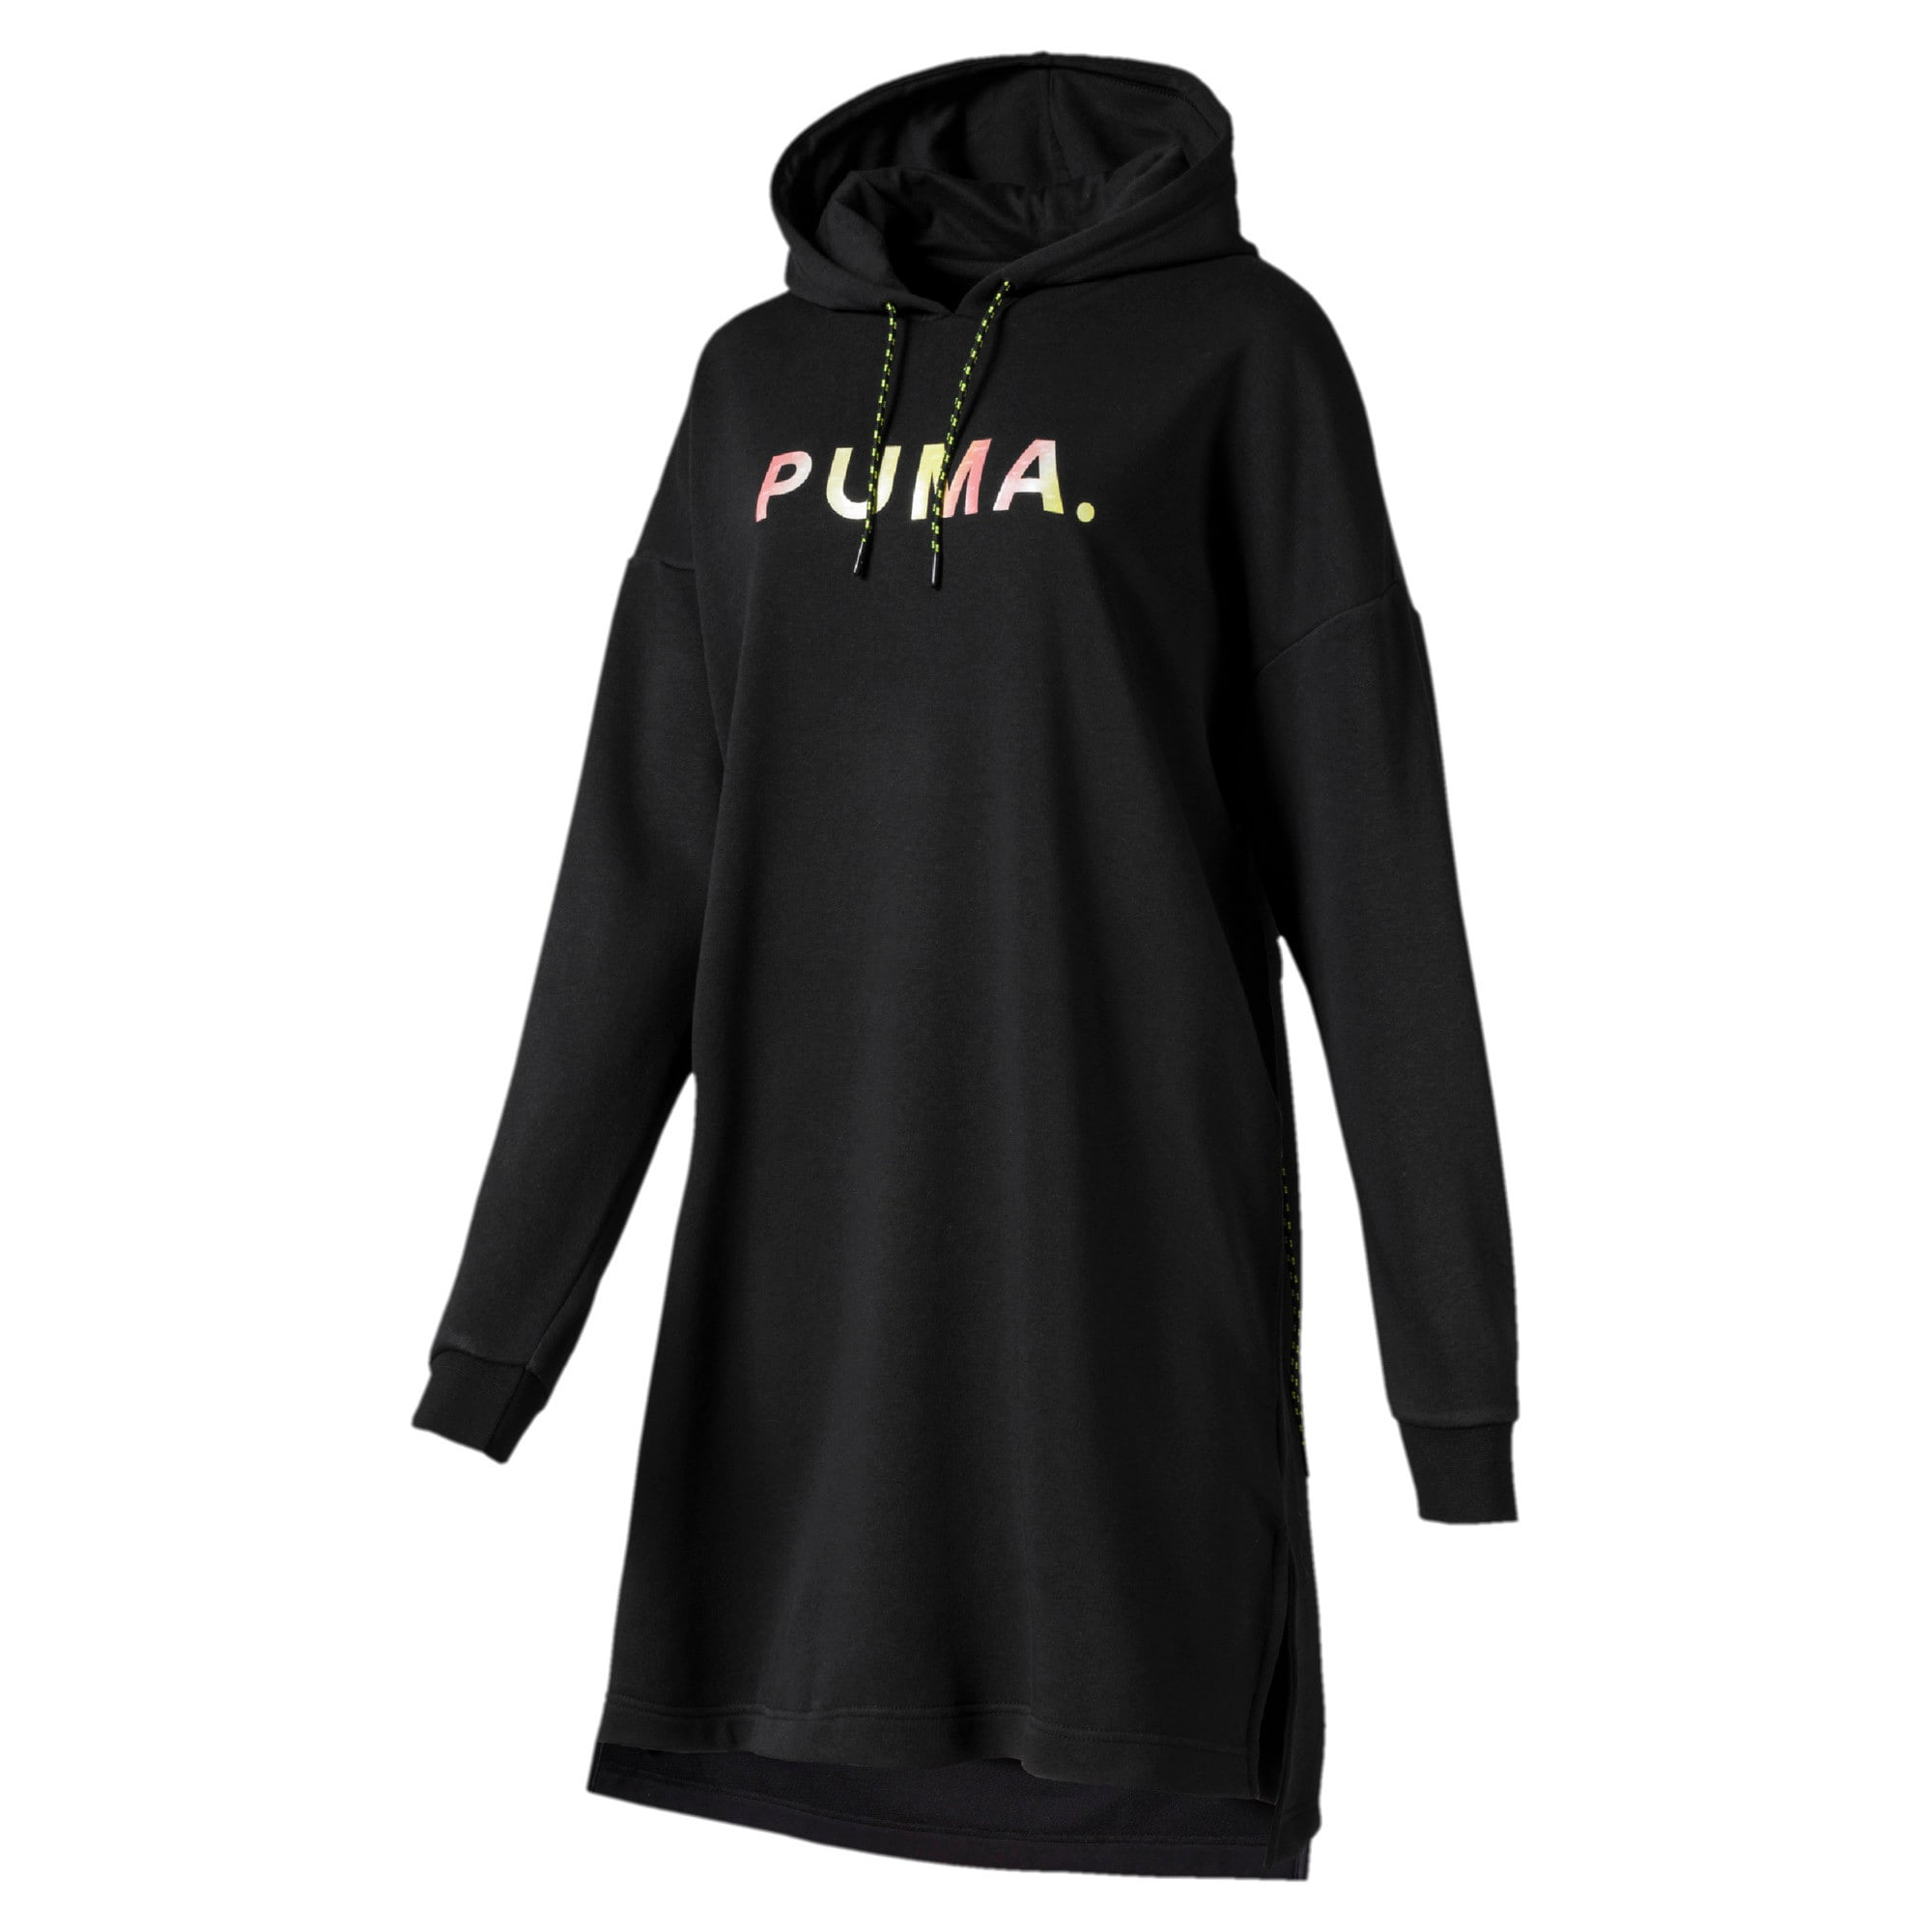 Thumbnail 4 of Chase Women's Hooded Dress, Puma Black, medium